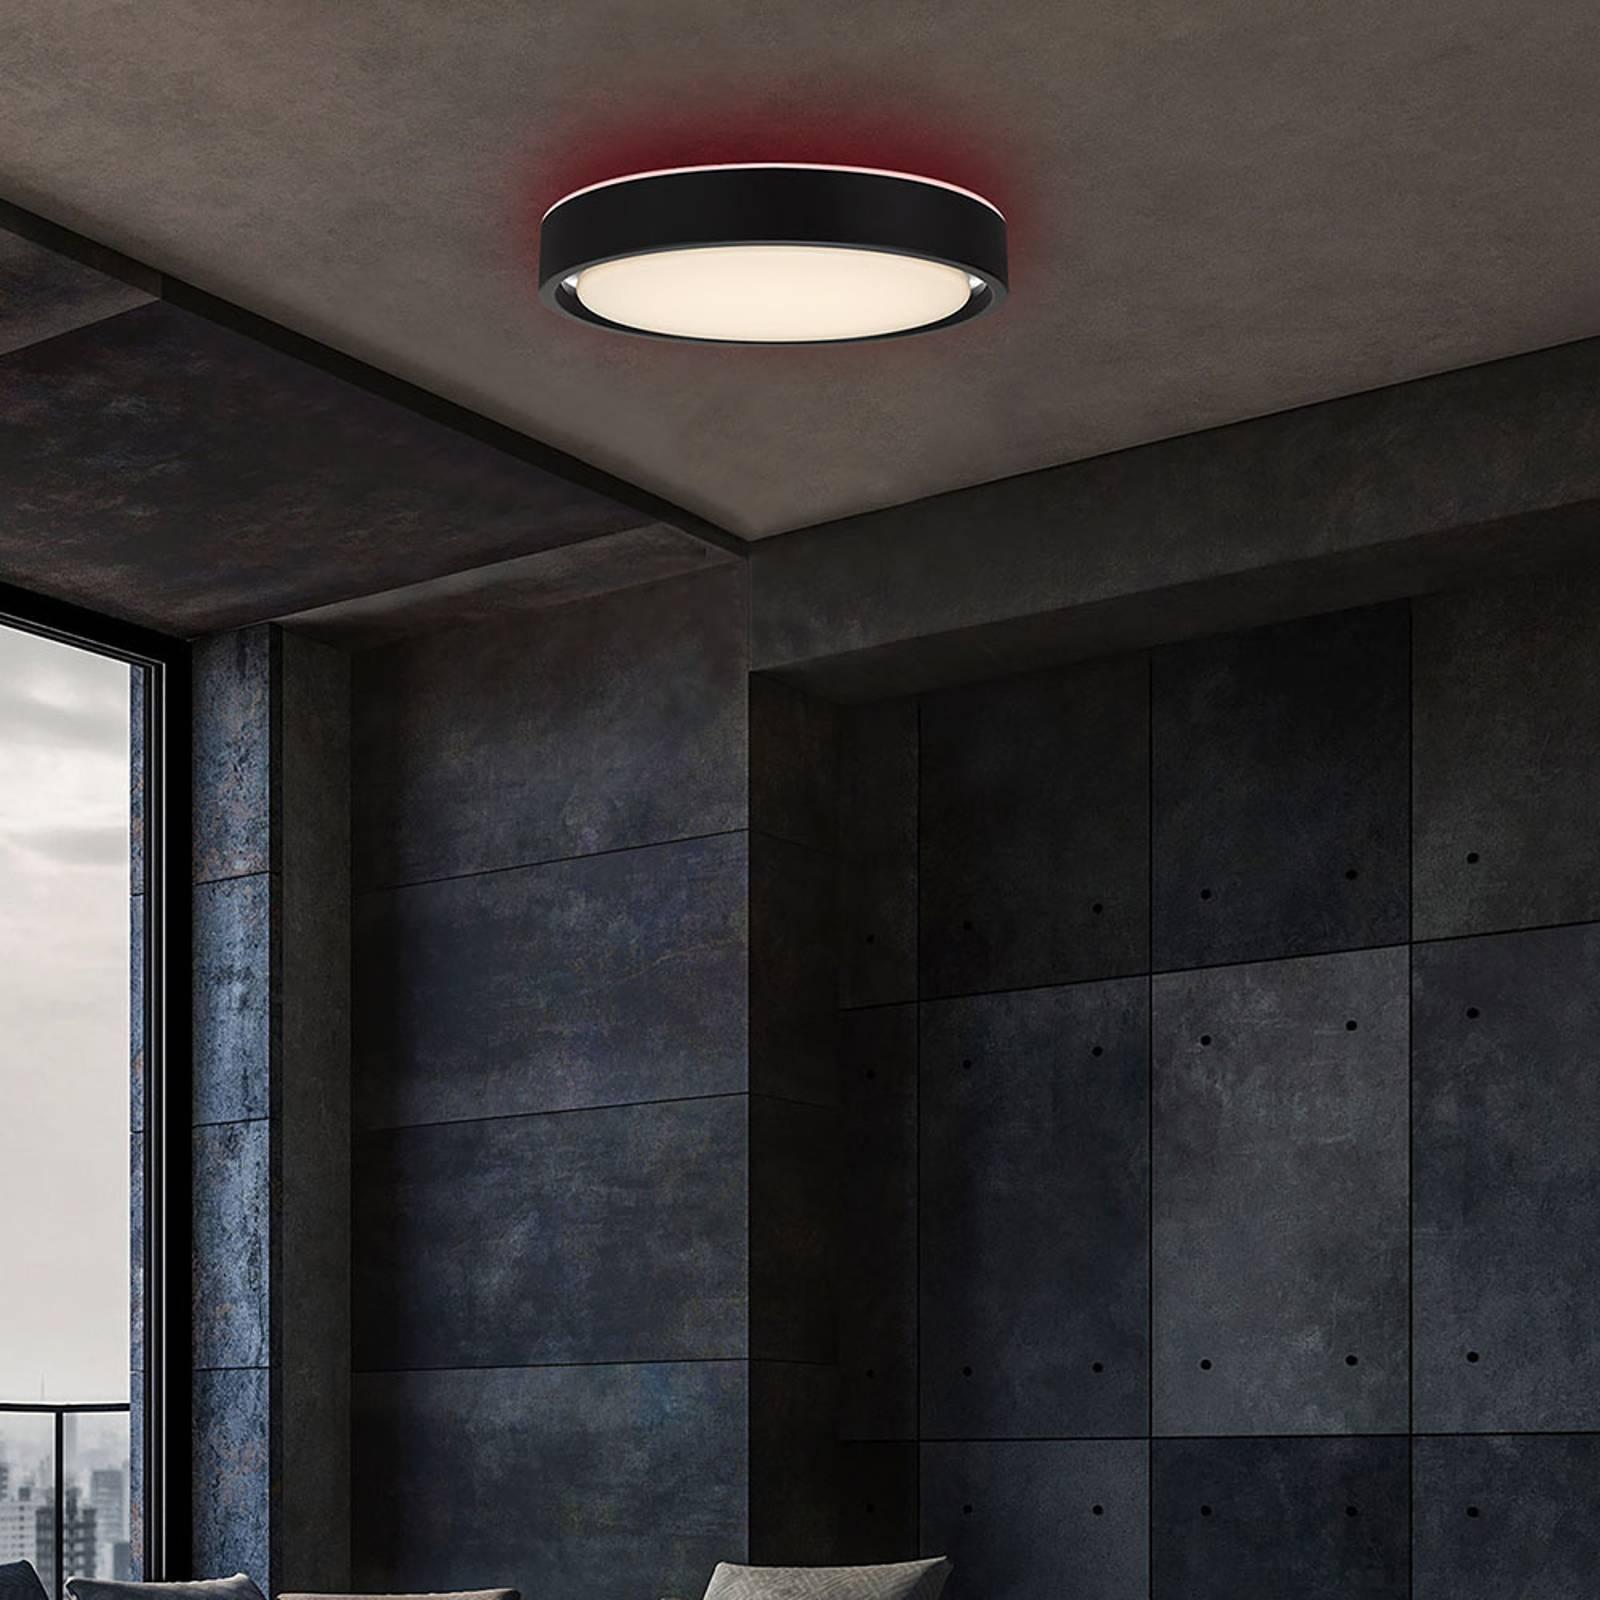 LED-kattovalo Talena M RGB CCT, tunnistin, musta